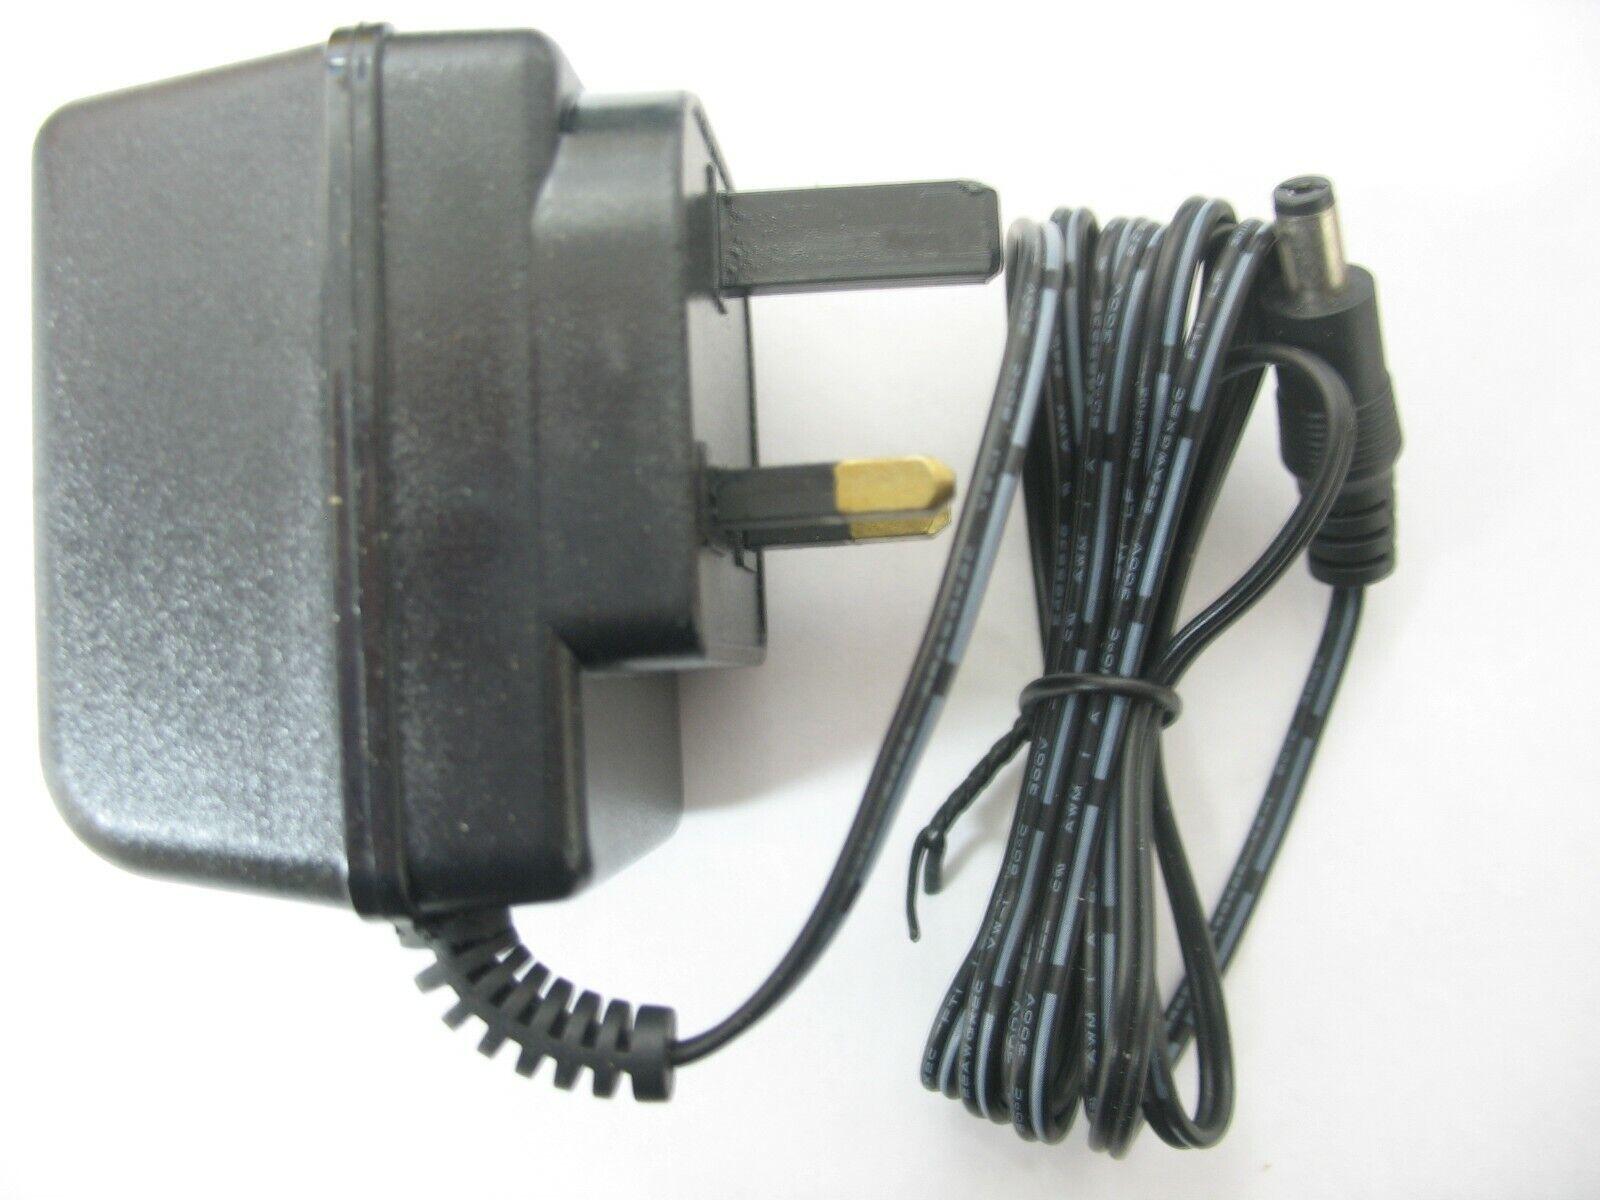 0.5 amp 15 volt AC-AC (AC Output) Mains Power Adaptor/Supply/Charger 7.5 watt